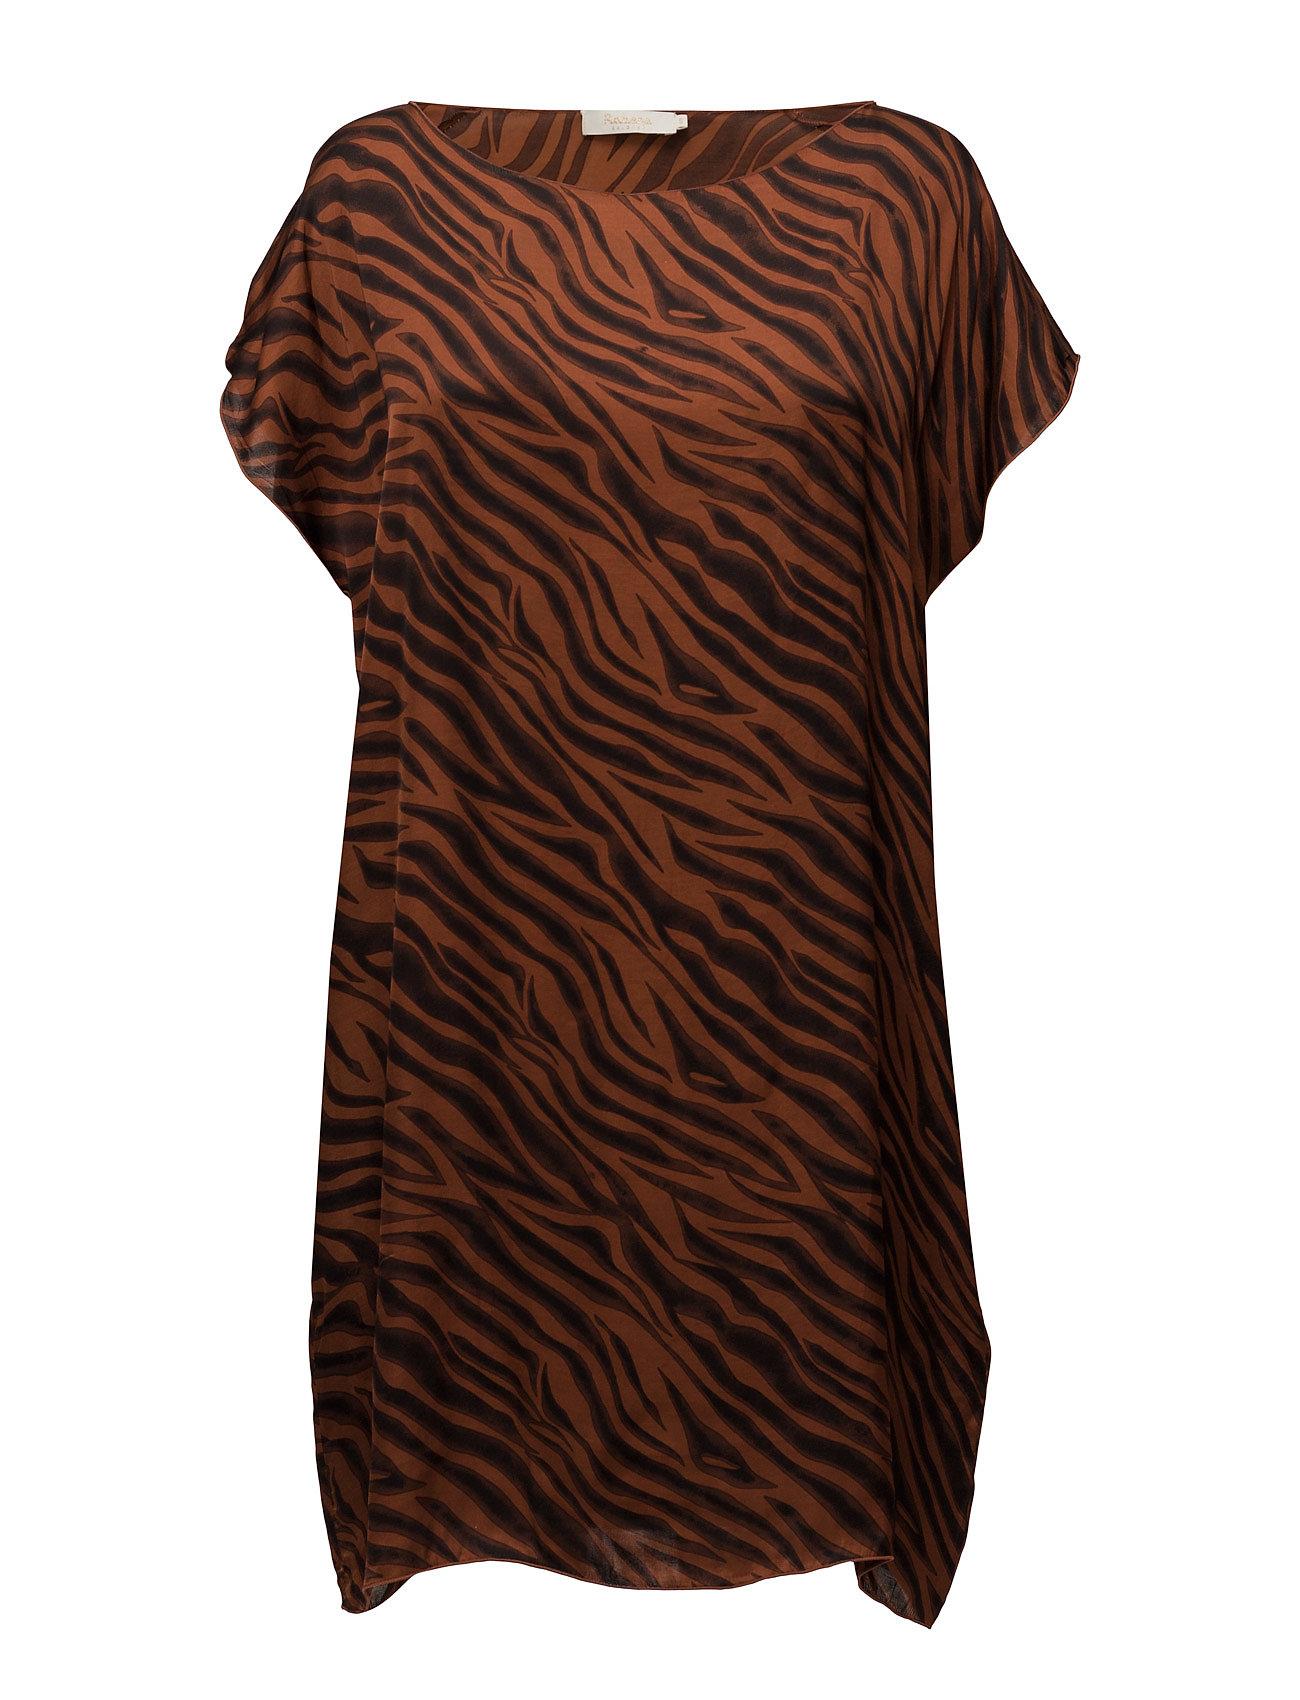 Zebra Scarf Dress Rabens Saloner Kjoler til Kvinder i